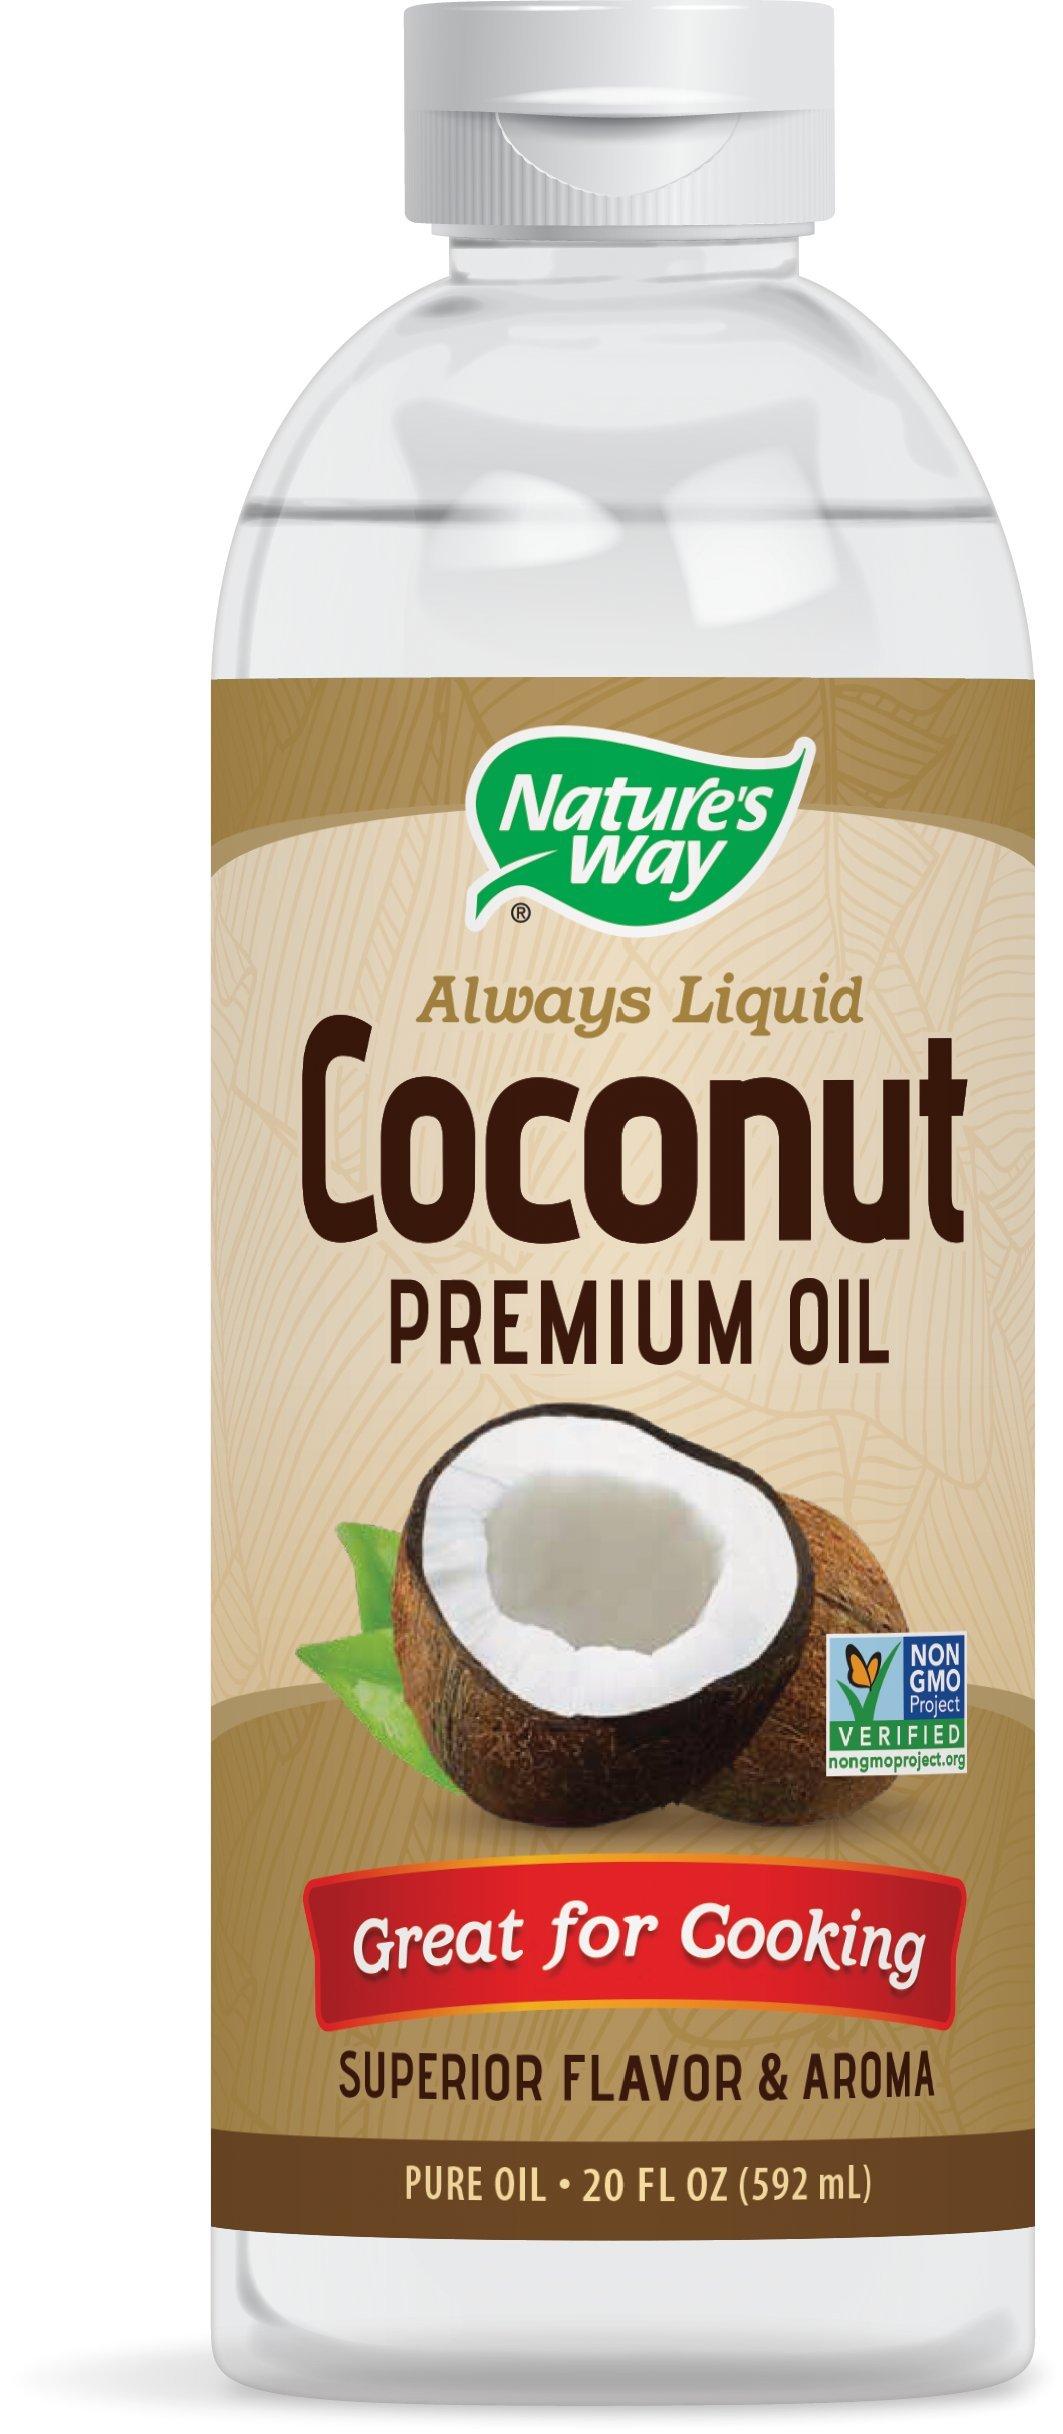 Amazon.com: Organic Rice Malt Syrup - 330g: Health